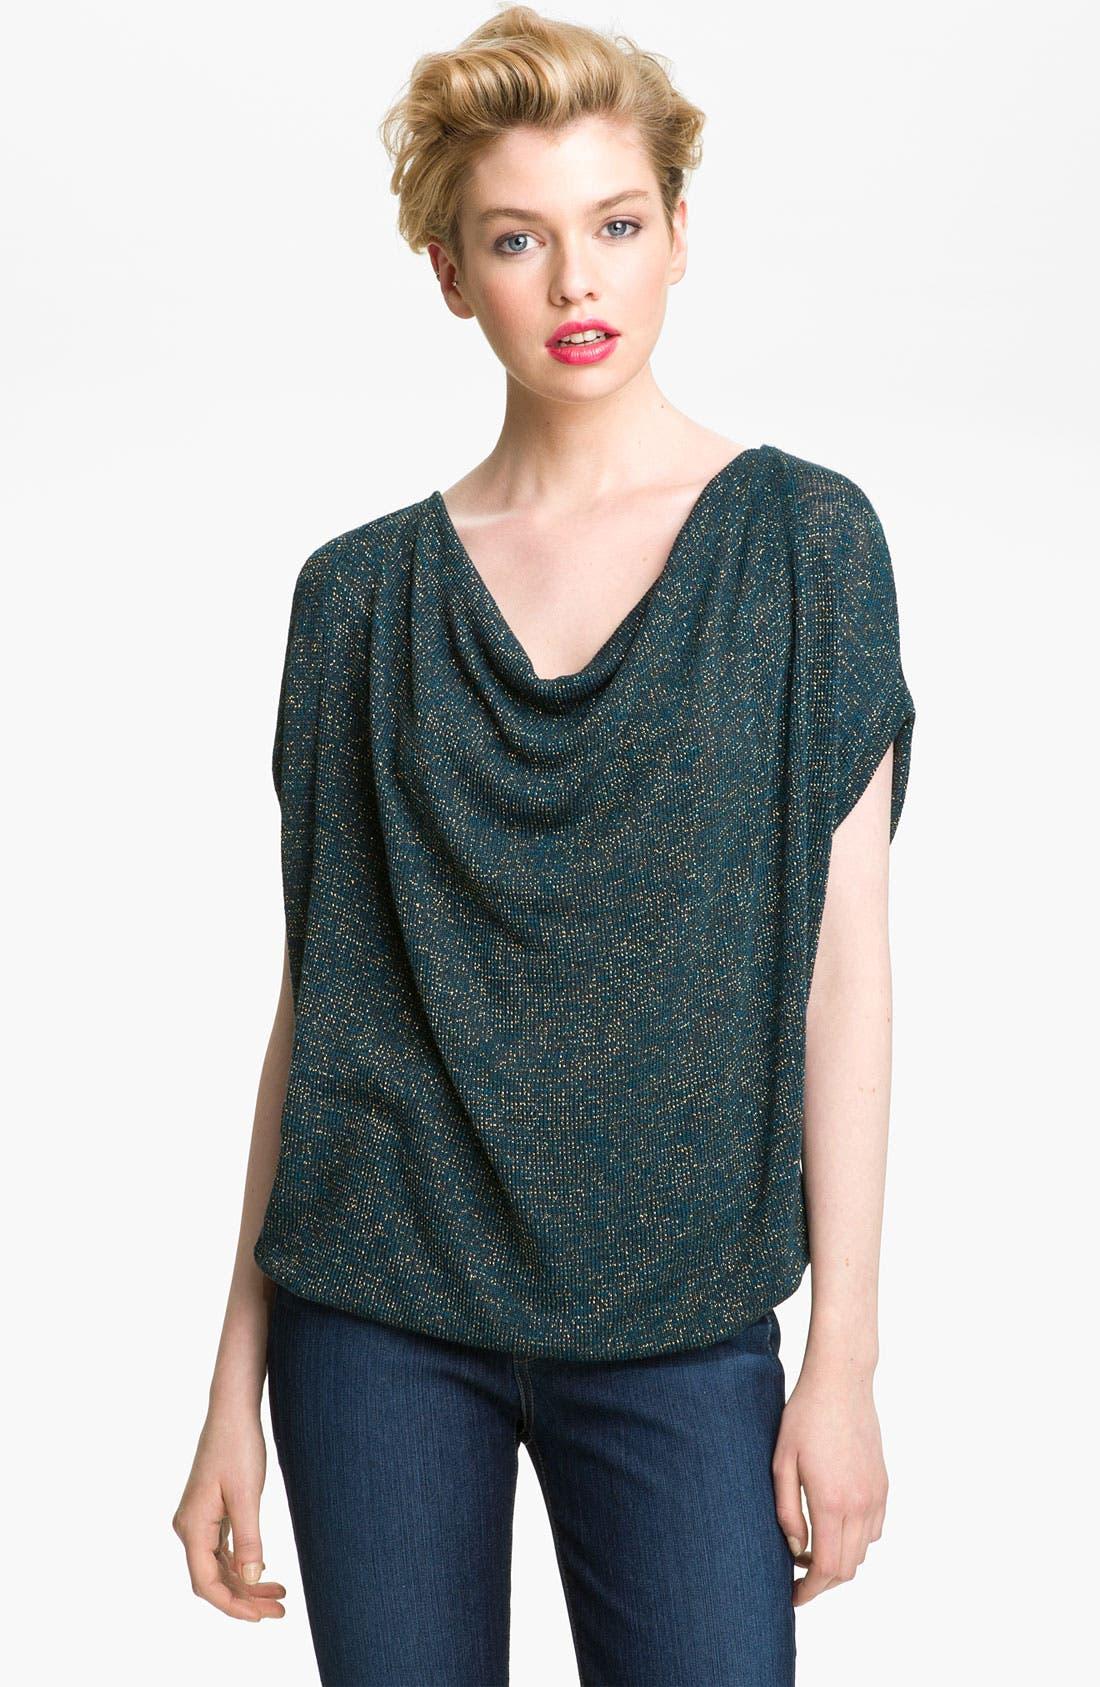 Alternate Image 1 Selected - Ella Moss Metallic Knit Top (Nordstrom Exclusive)